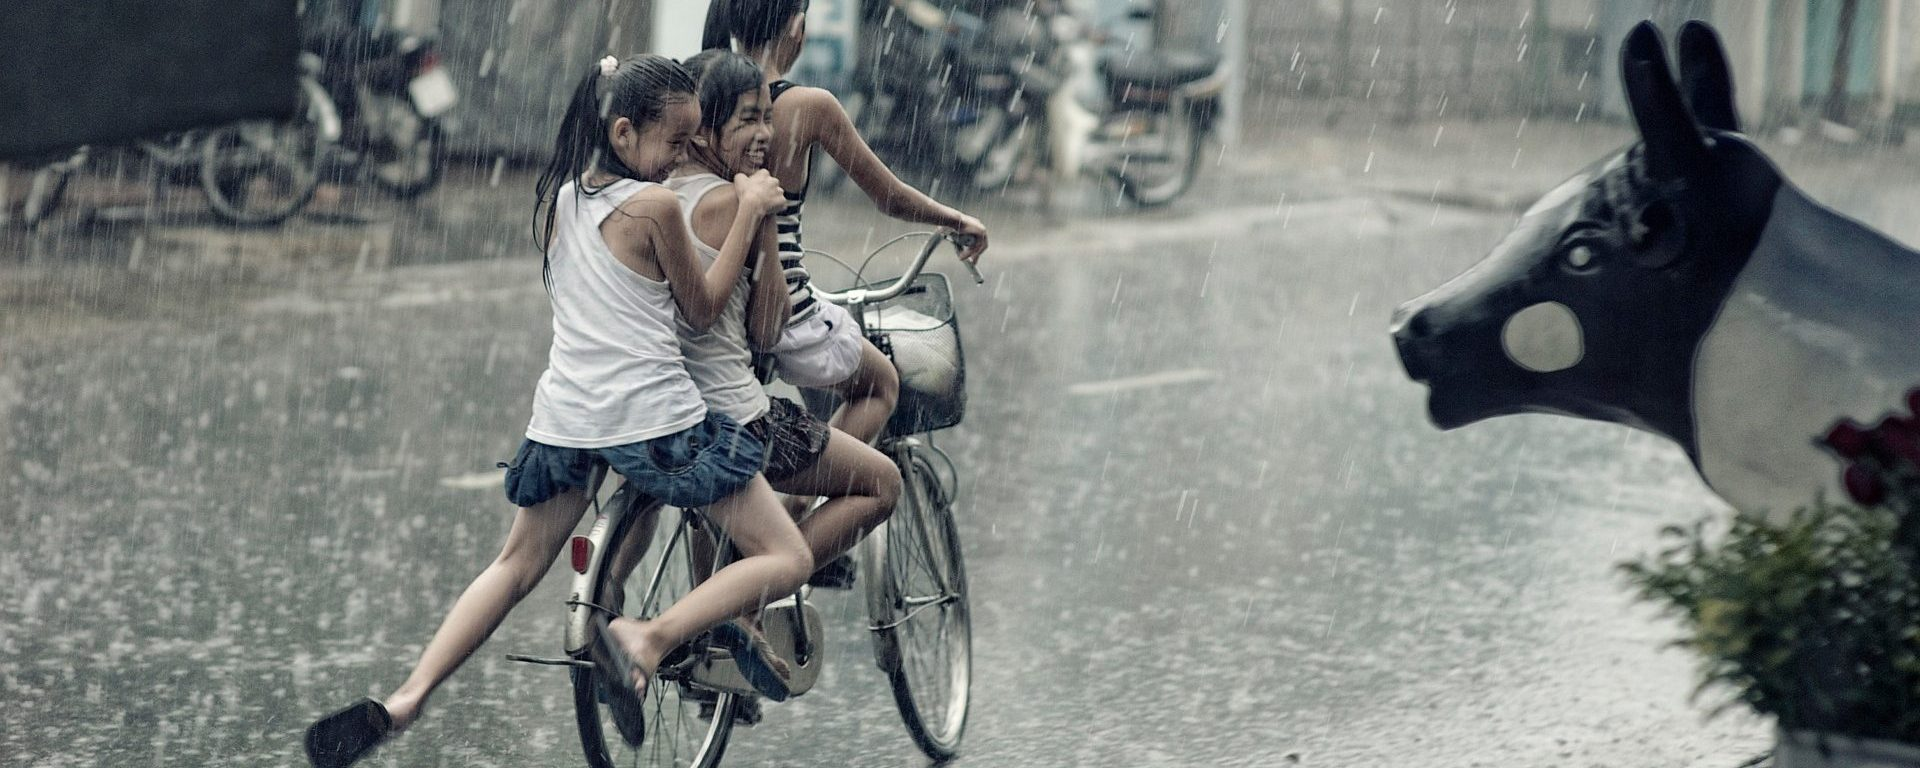 children,happy,playing,riding,bicycle,rain,plants,pot,street,kids,girls,smile,statue,DON CHARISMA